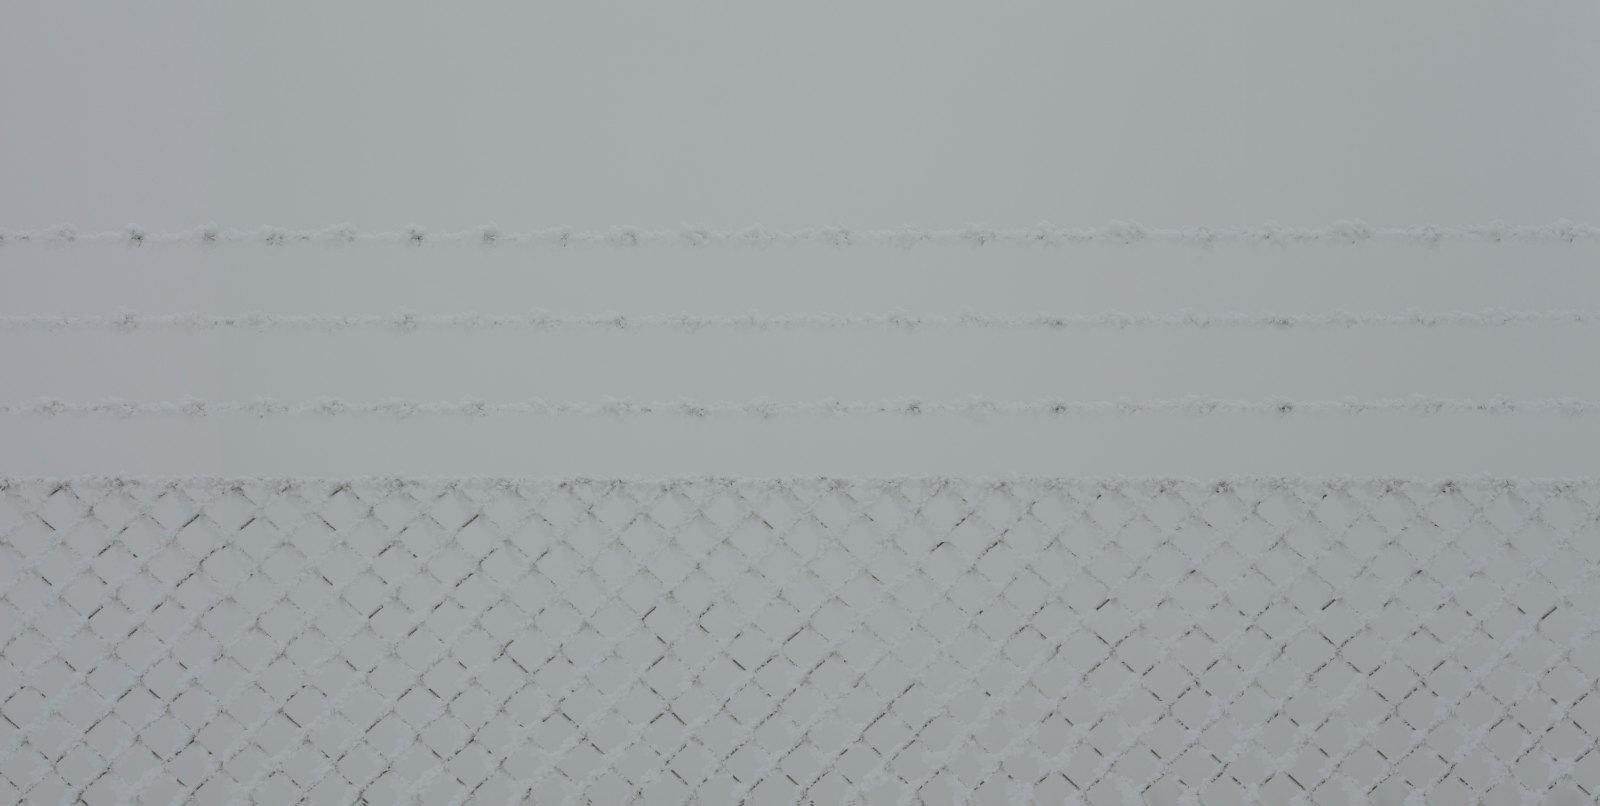 Permissions, 2010, giclée print, aluminium, 101,5 x 200 cm